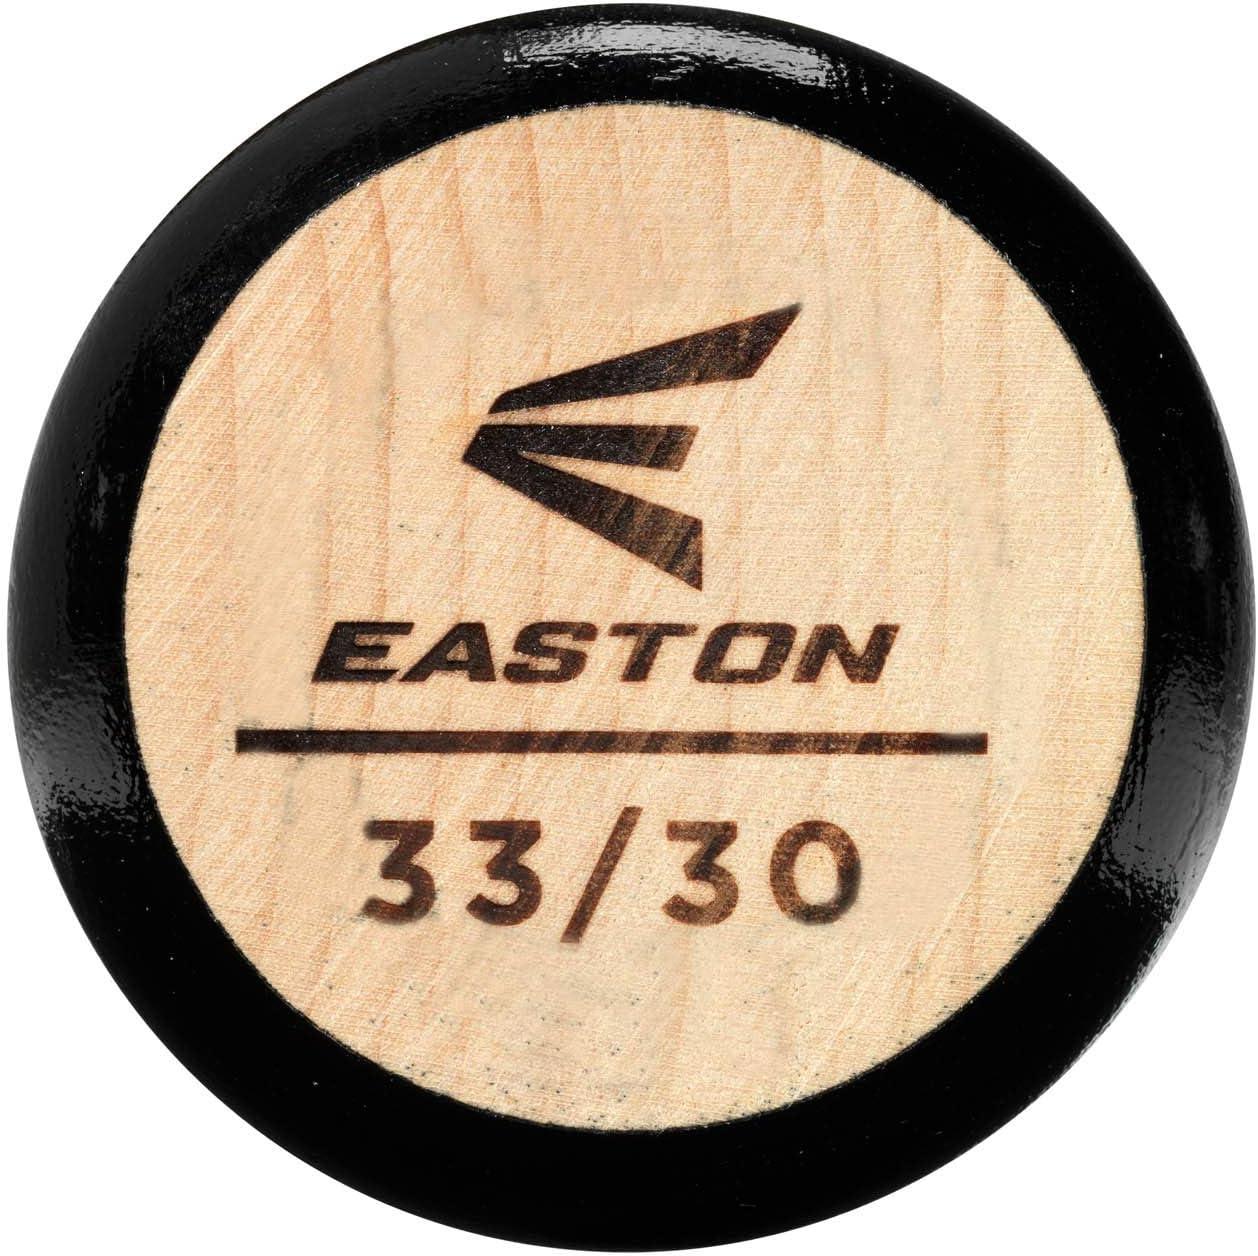 Pro Grade Maple Larger Knob Balanced 2020 Handcrafted in USA Medium Barrel // Handle EASTON Pro 271 Maple Wood Baseball Bat MLB Ink Dot Longer Taper